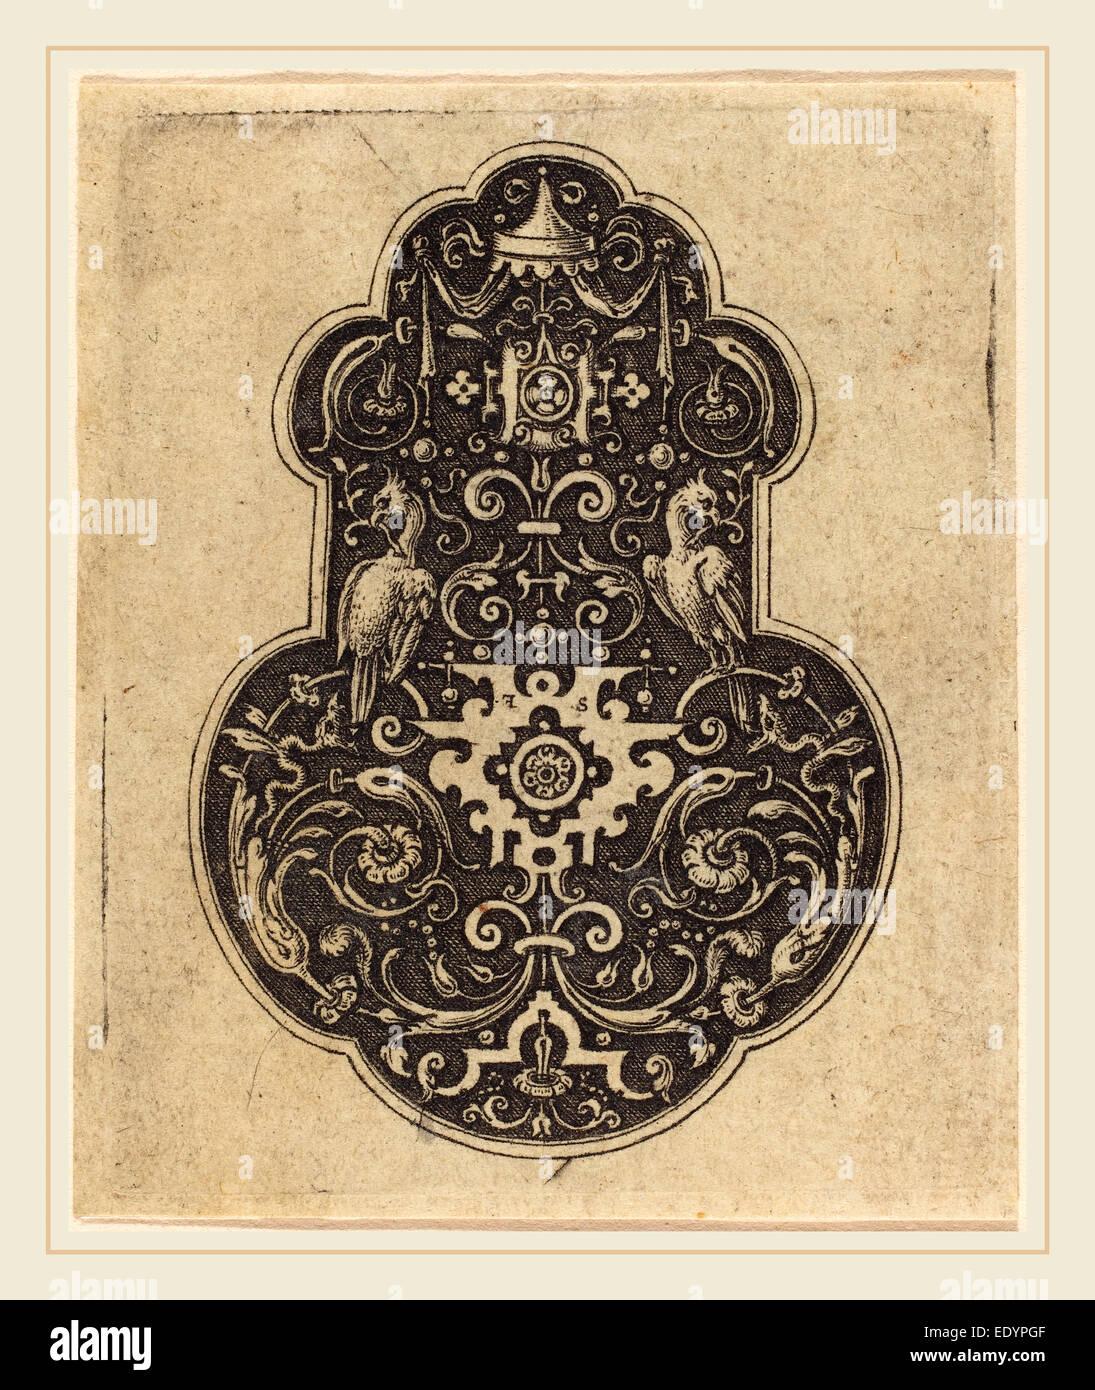 Etienne Delaune, French (1518-1519-1583), Arabesque Designs, engraving - Stock Image